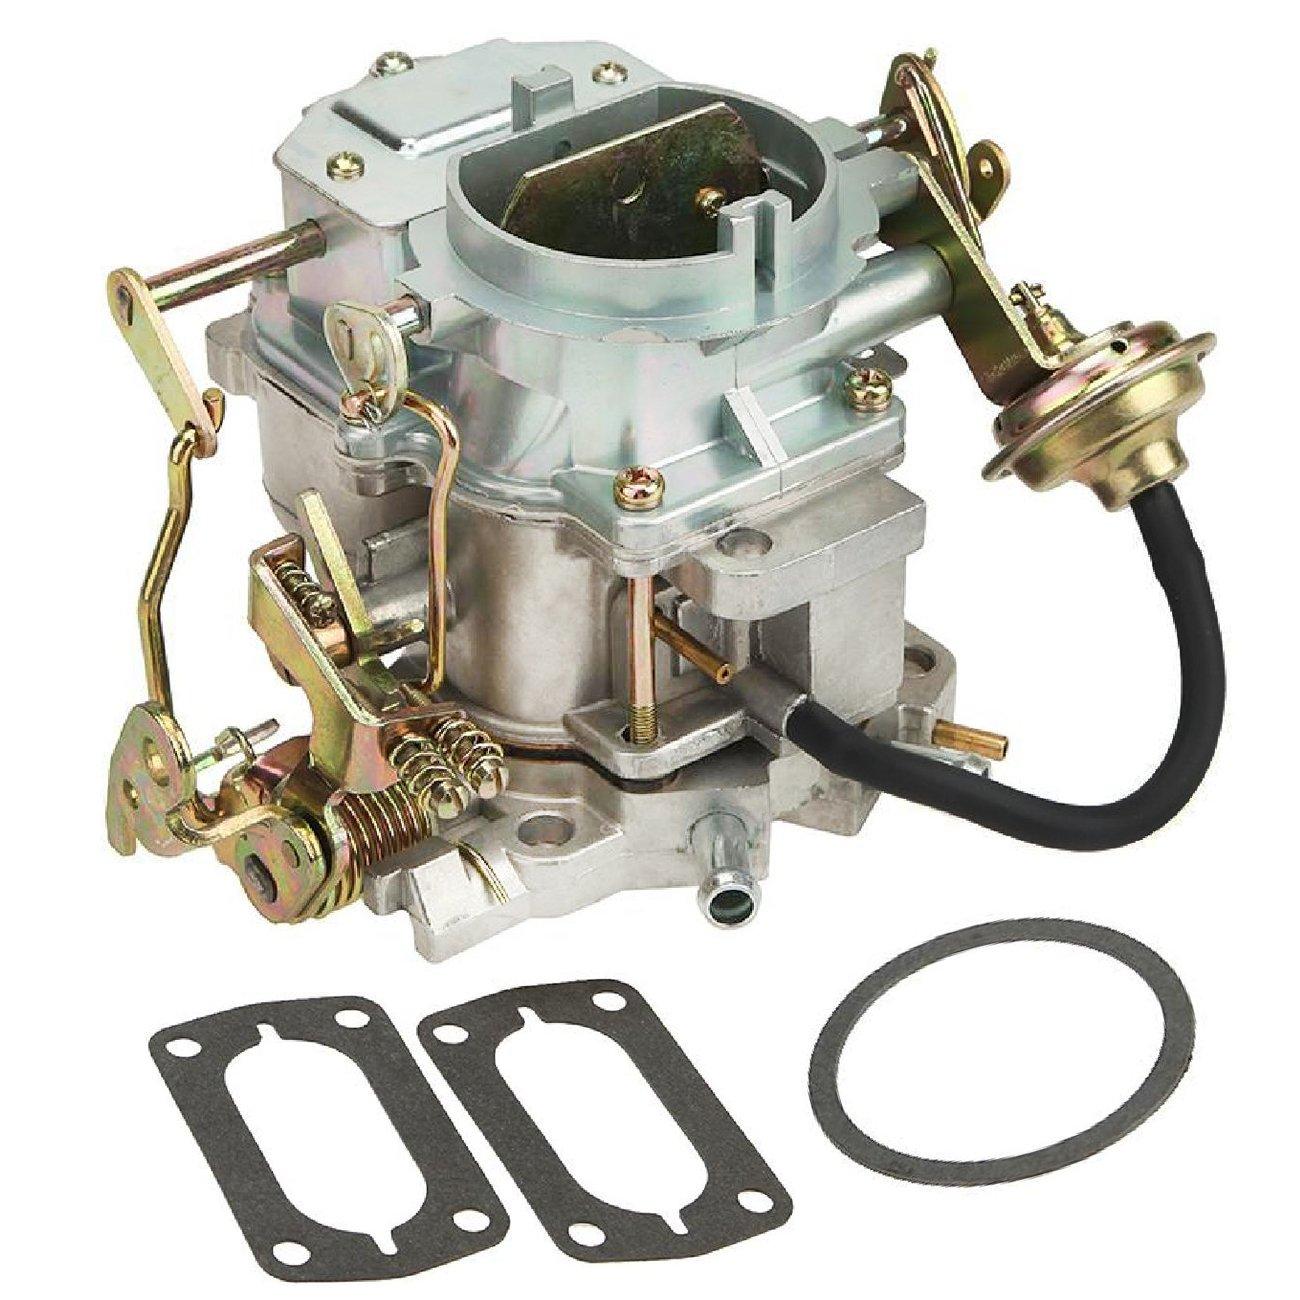 Amazon.com: Partol Carburetor Carb for 1966-1973 Dodge Plymouth/Dodge Truck  with 273-318 Engine - Manual Choke: Automotive